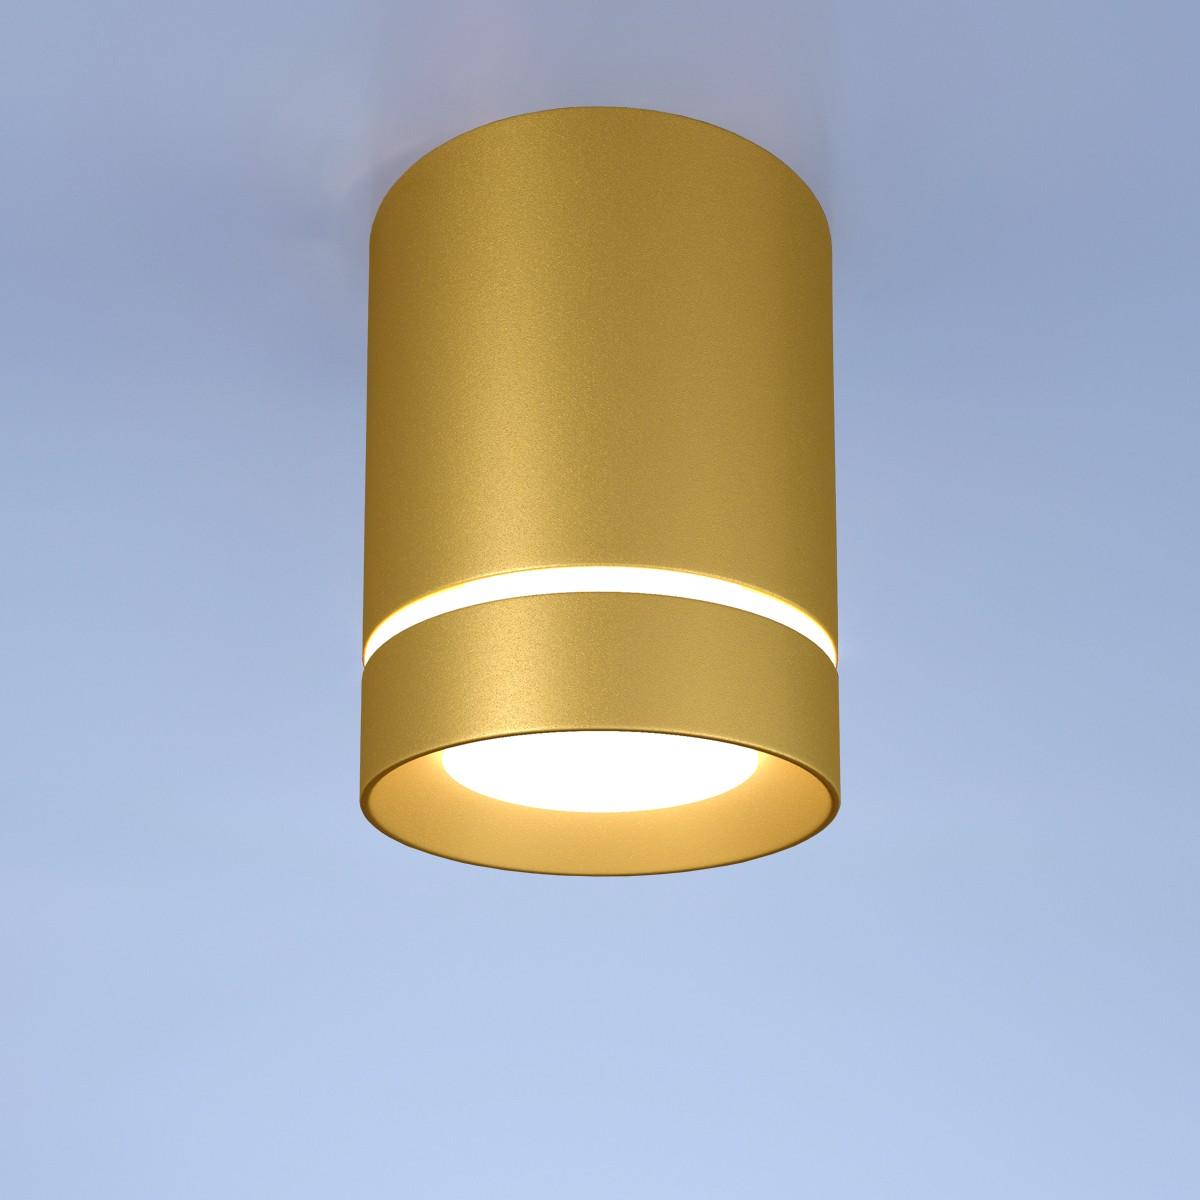 DLR021 9W 4200K золото матовый